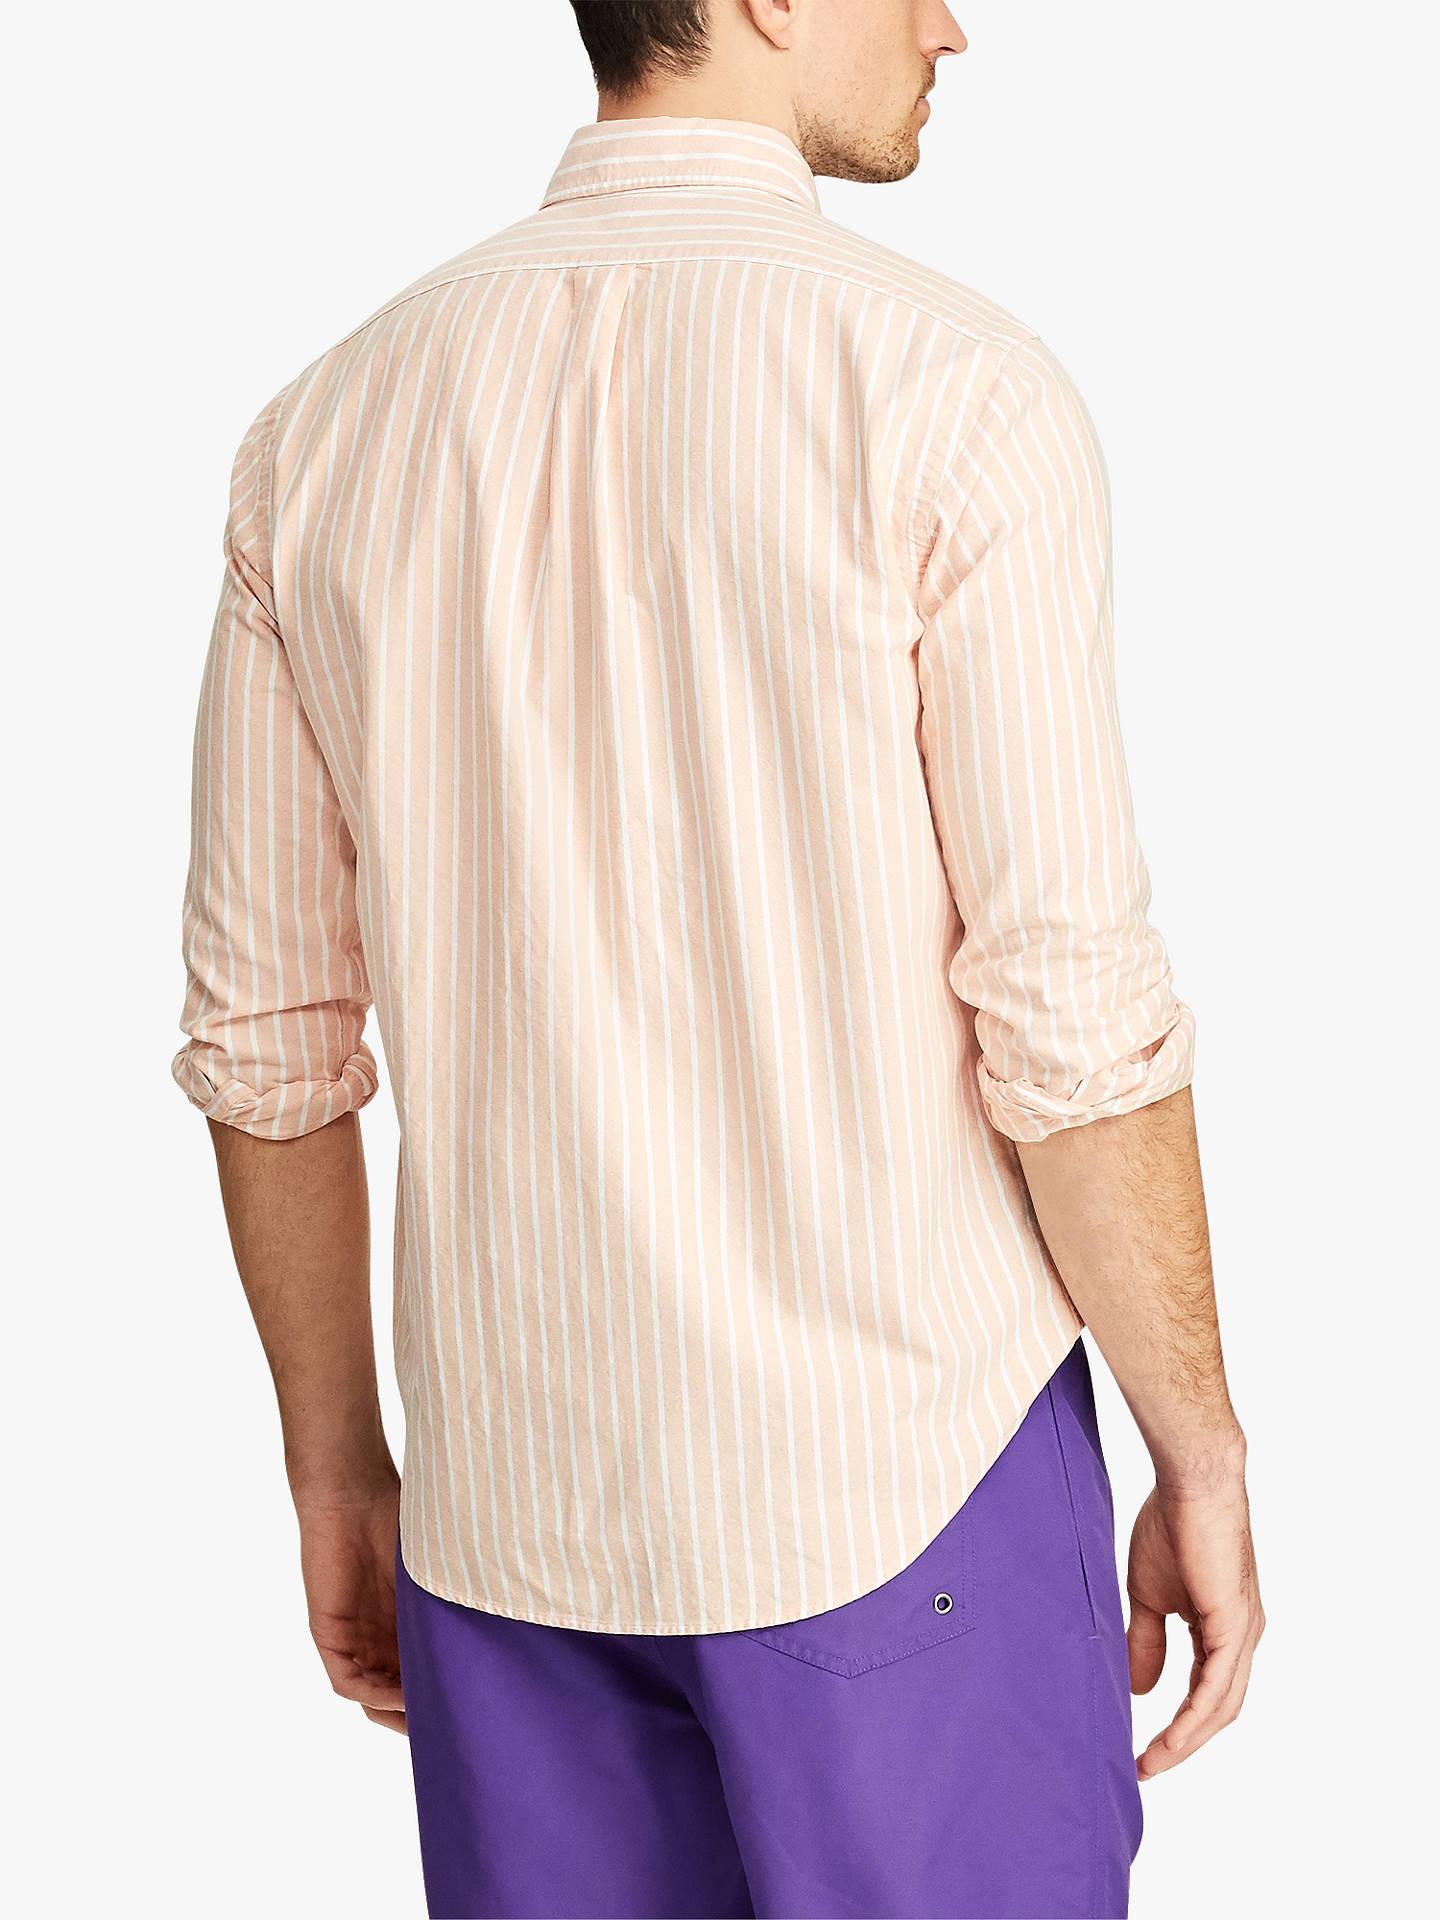 e3a71acb ... Buy Polo Ralph Lauren Slim Fit Striped Oxford Shirt, Tangerine/White, S  Online ...